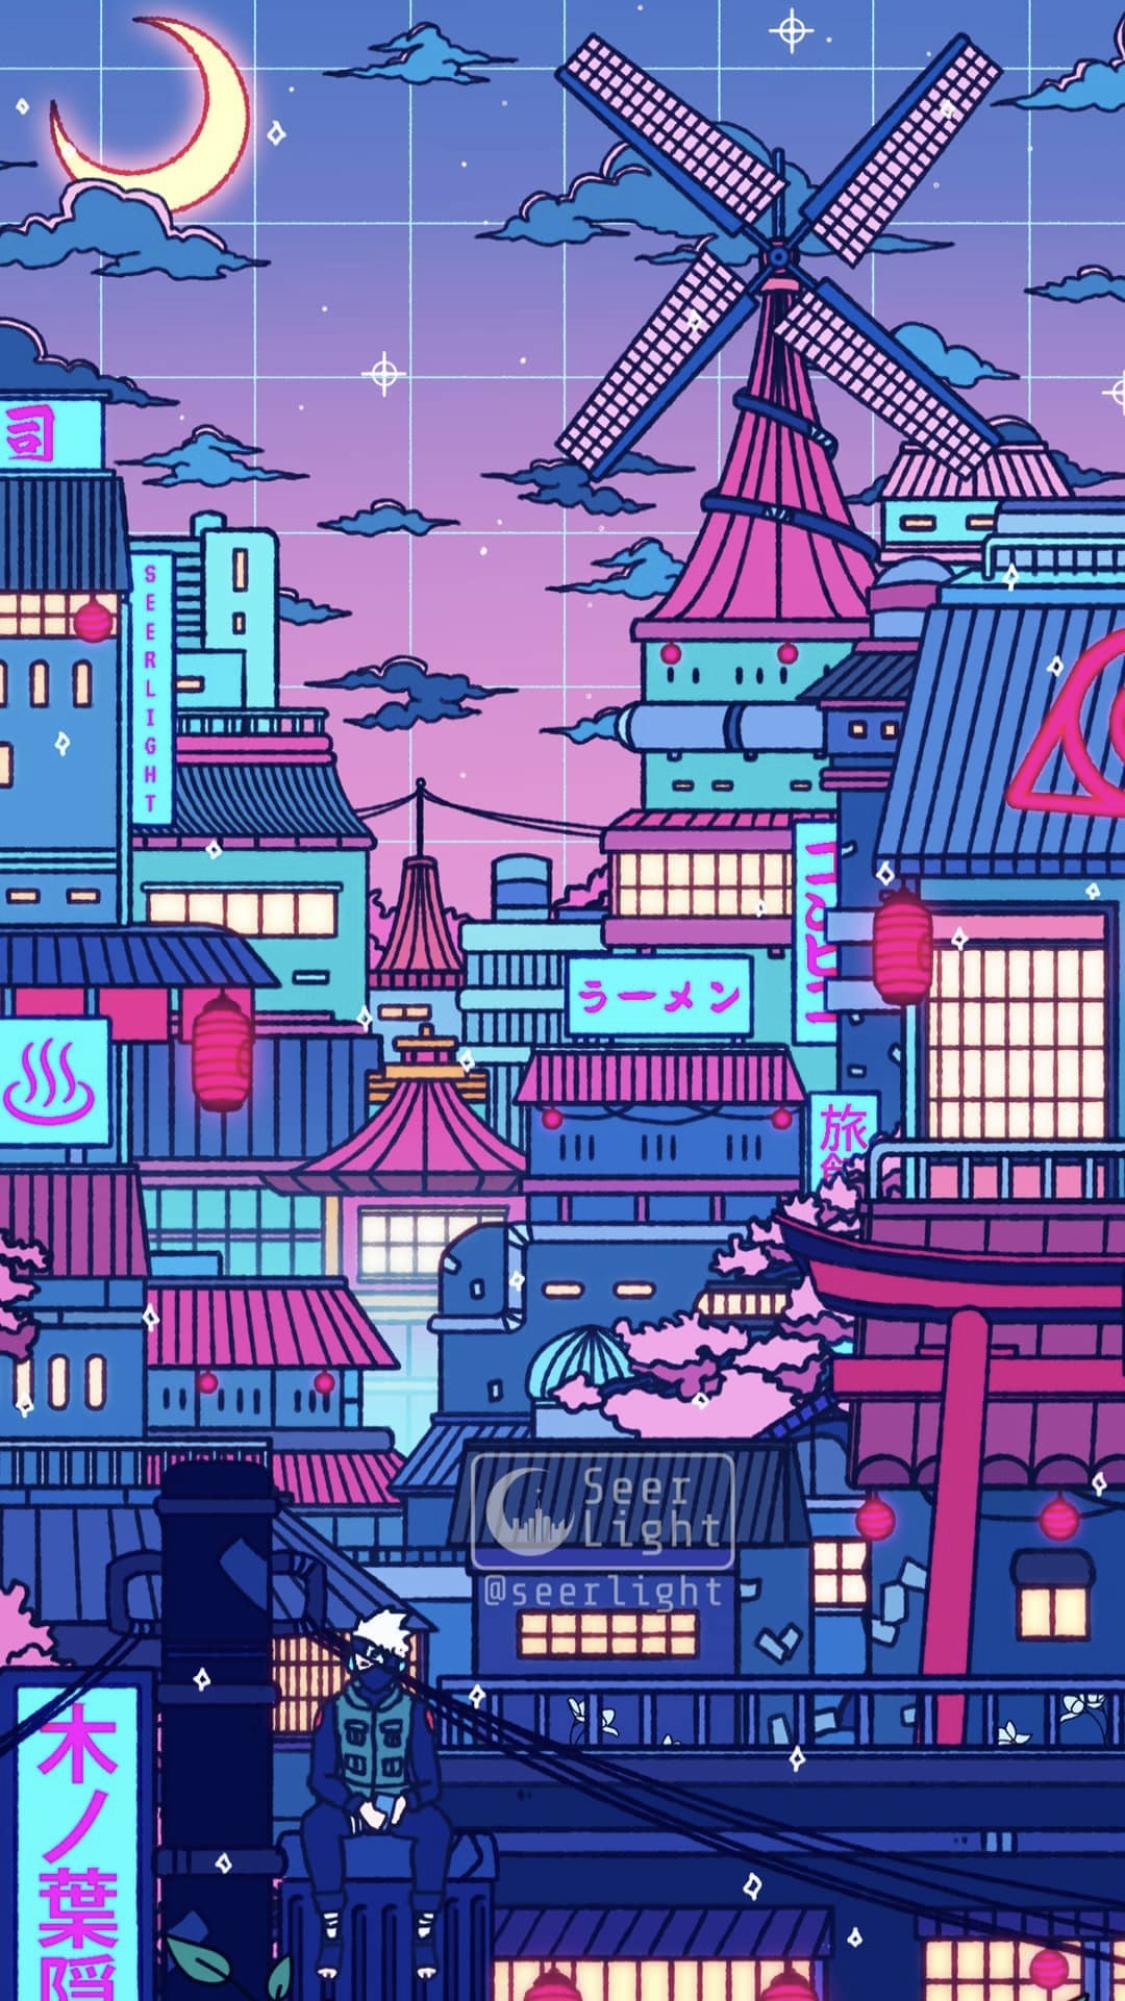 Naruto Vaporwave Wallpaper Anime Scenery Wallpaper Anime Wallpaper Iphone